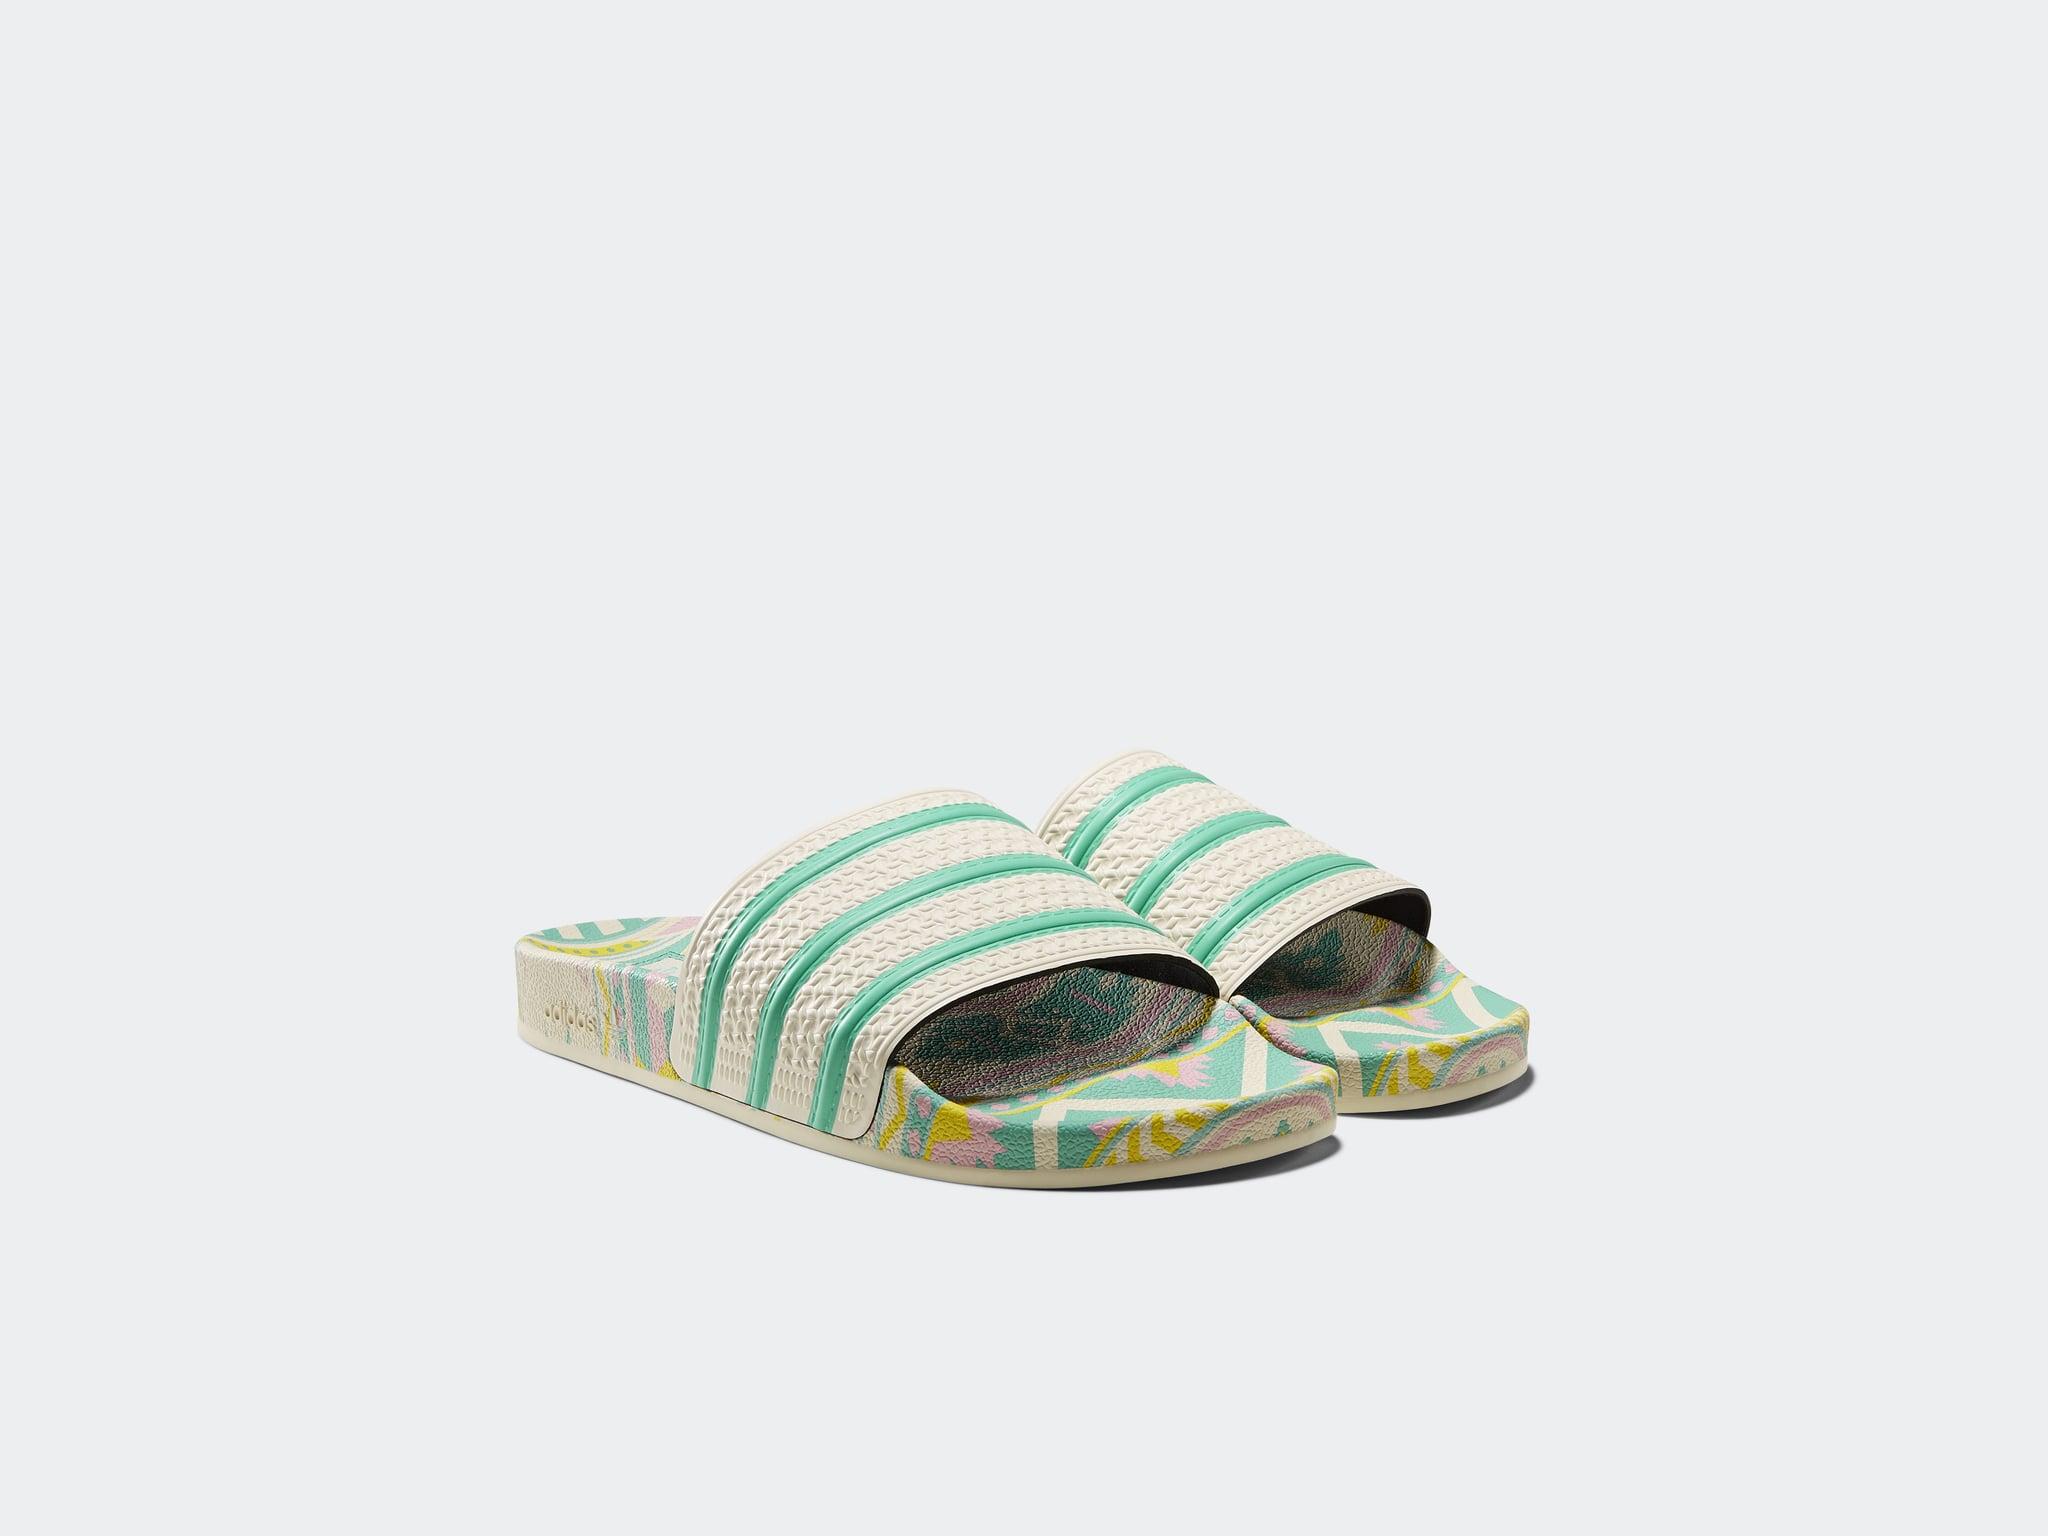 Adidas Arizona Iced Tea Sneaker and